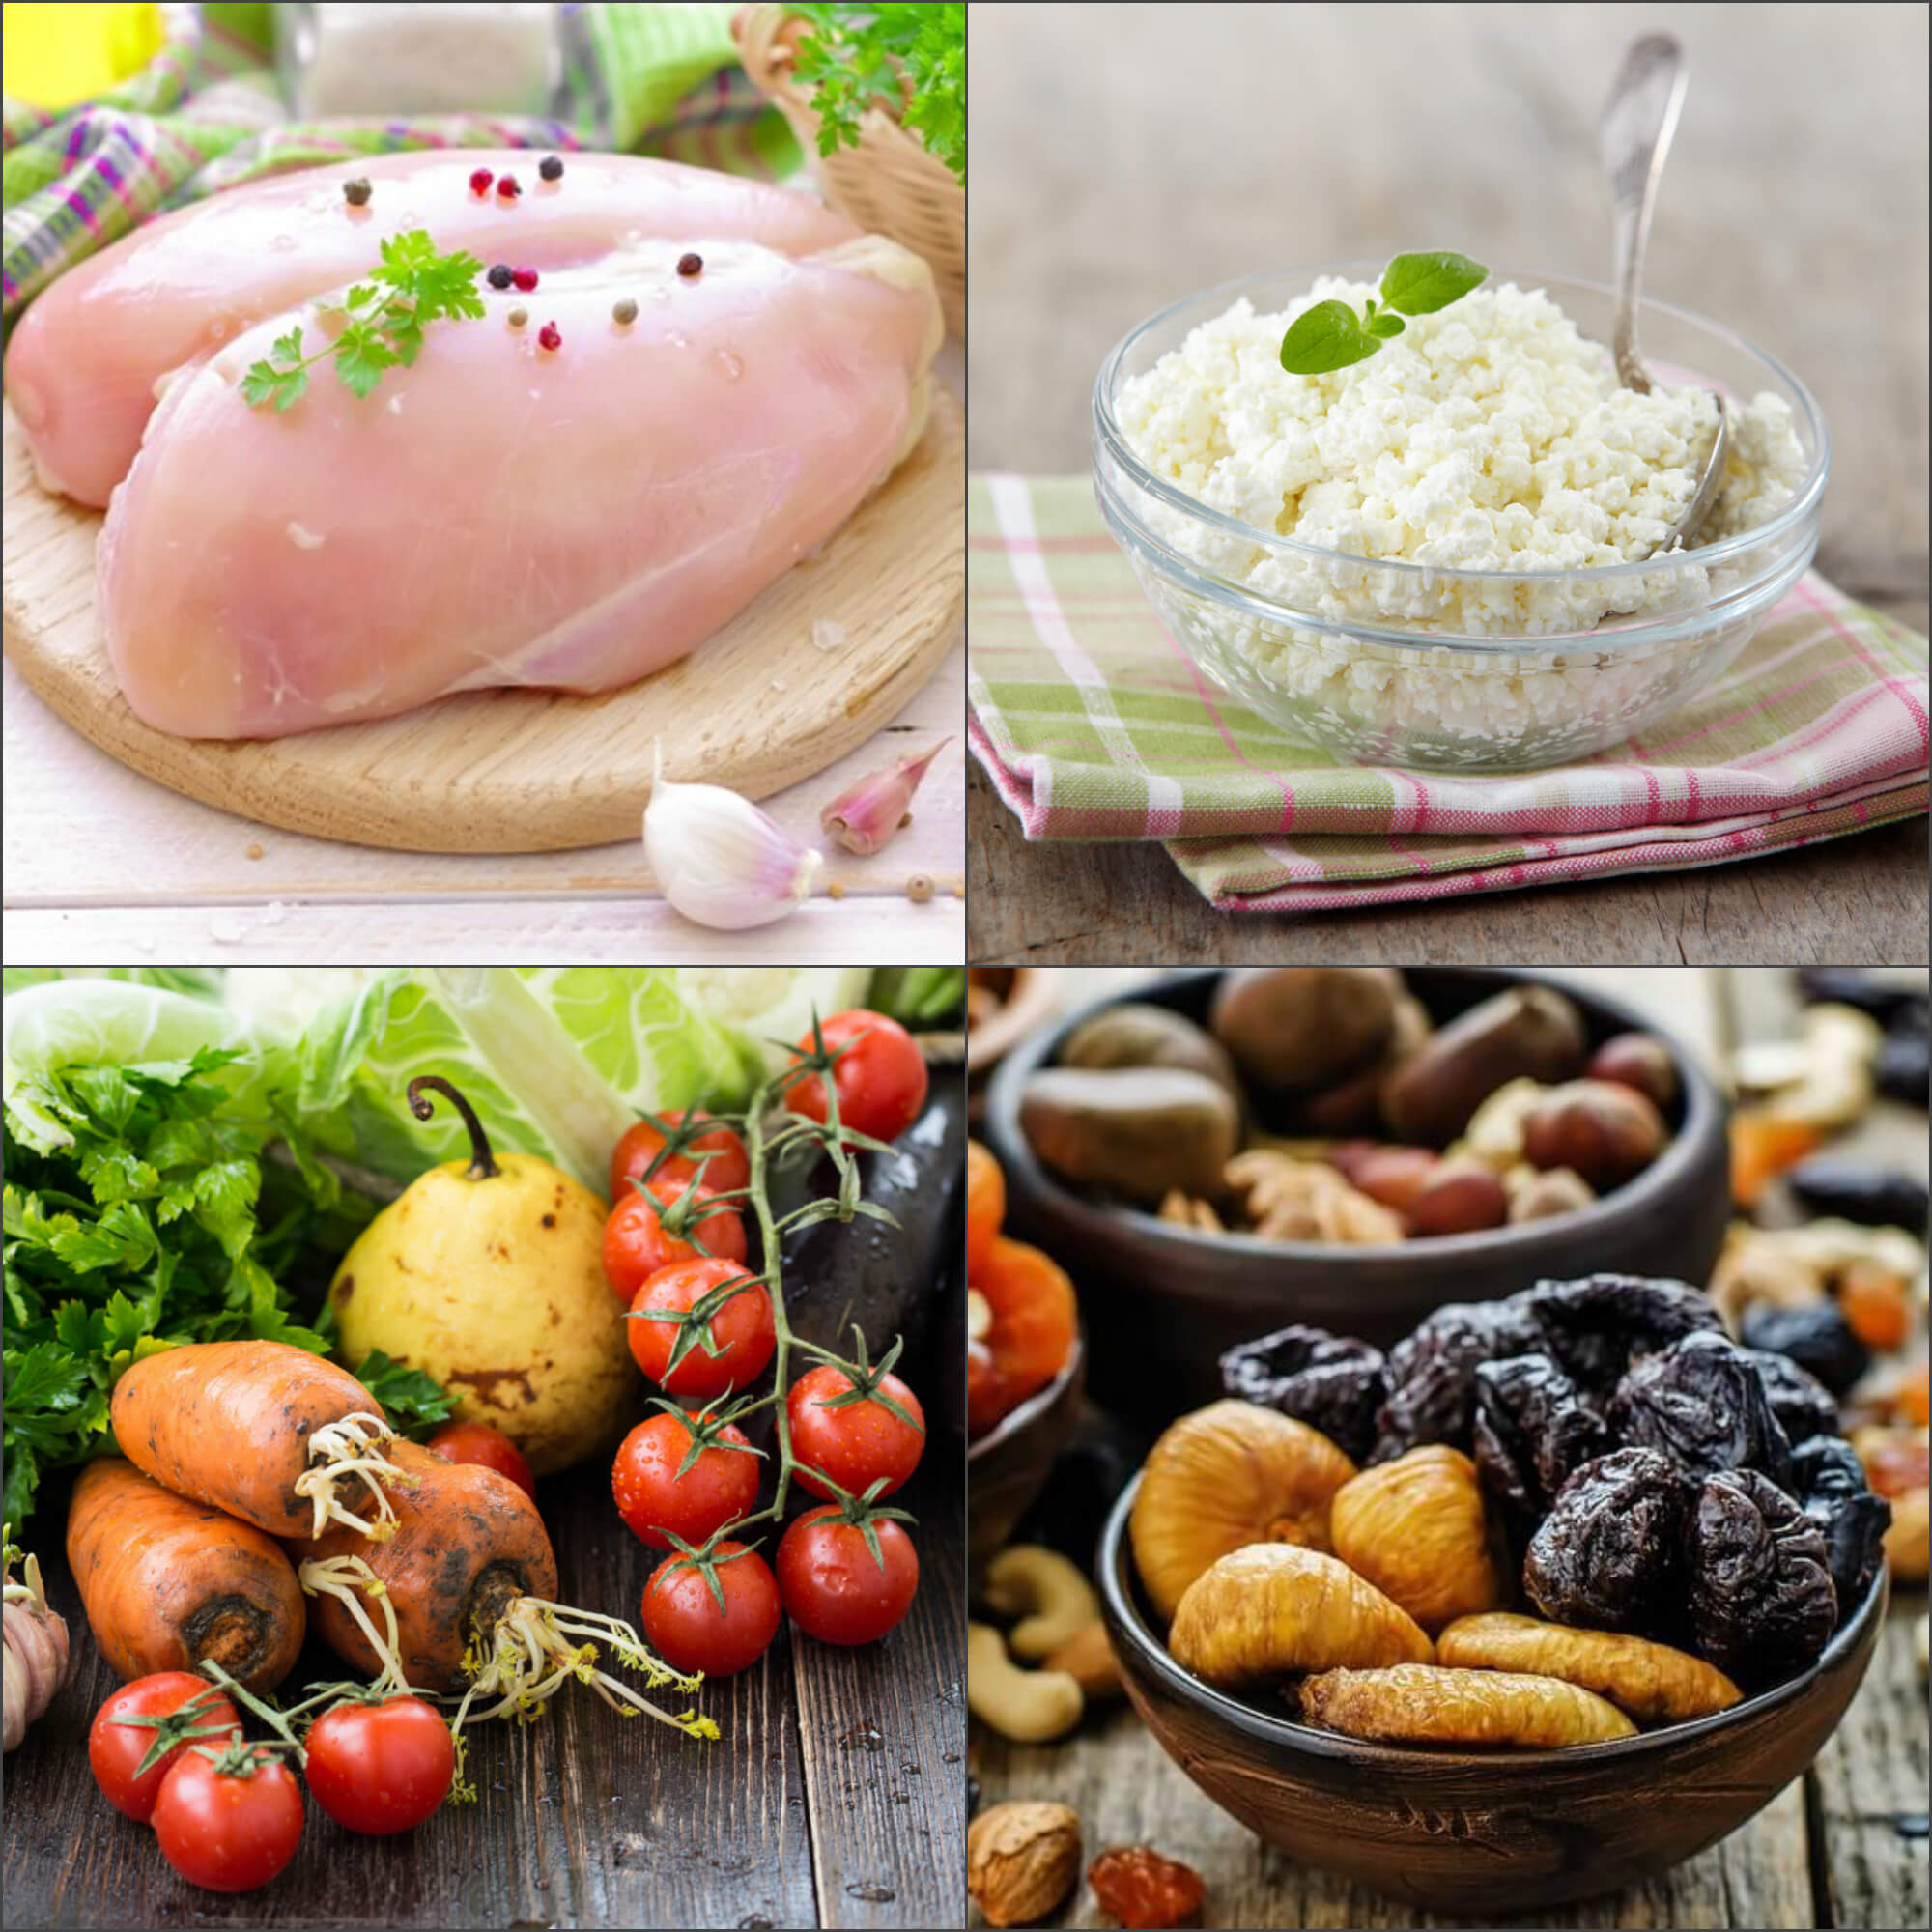 снижают ли холестерин семена льна отзывы